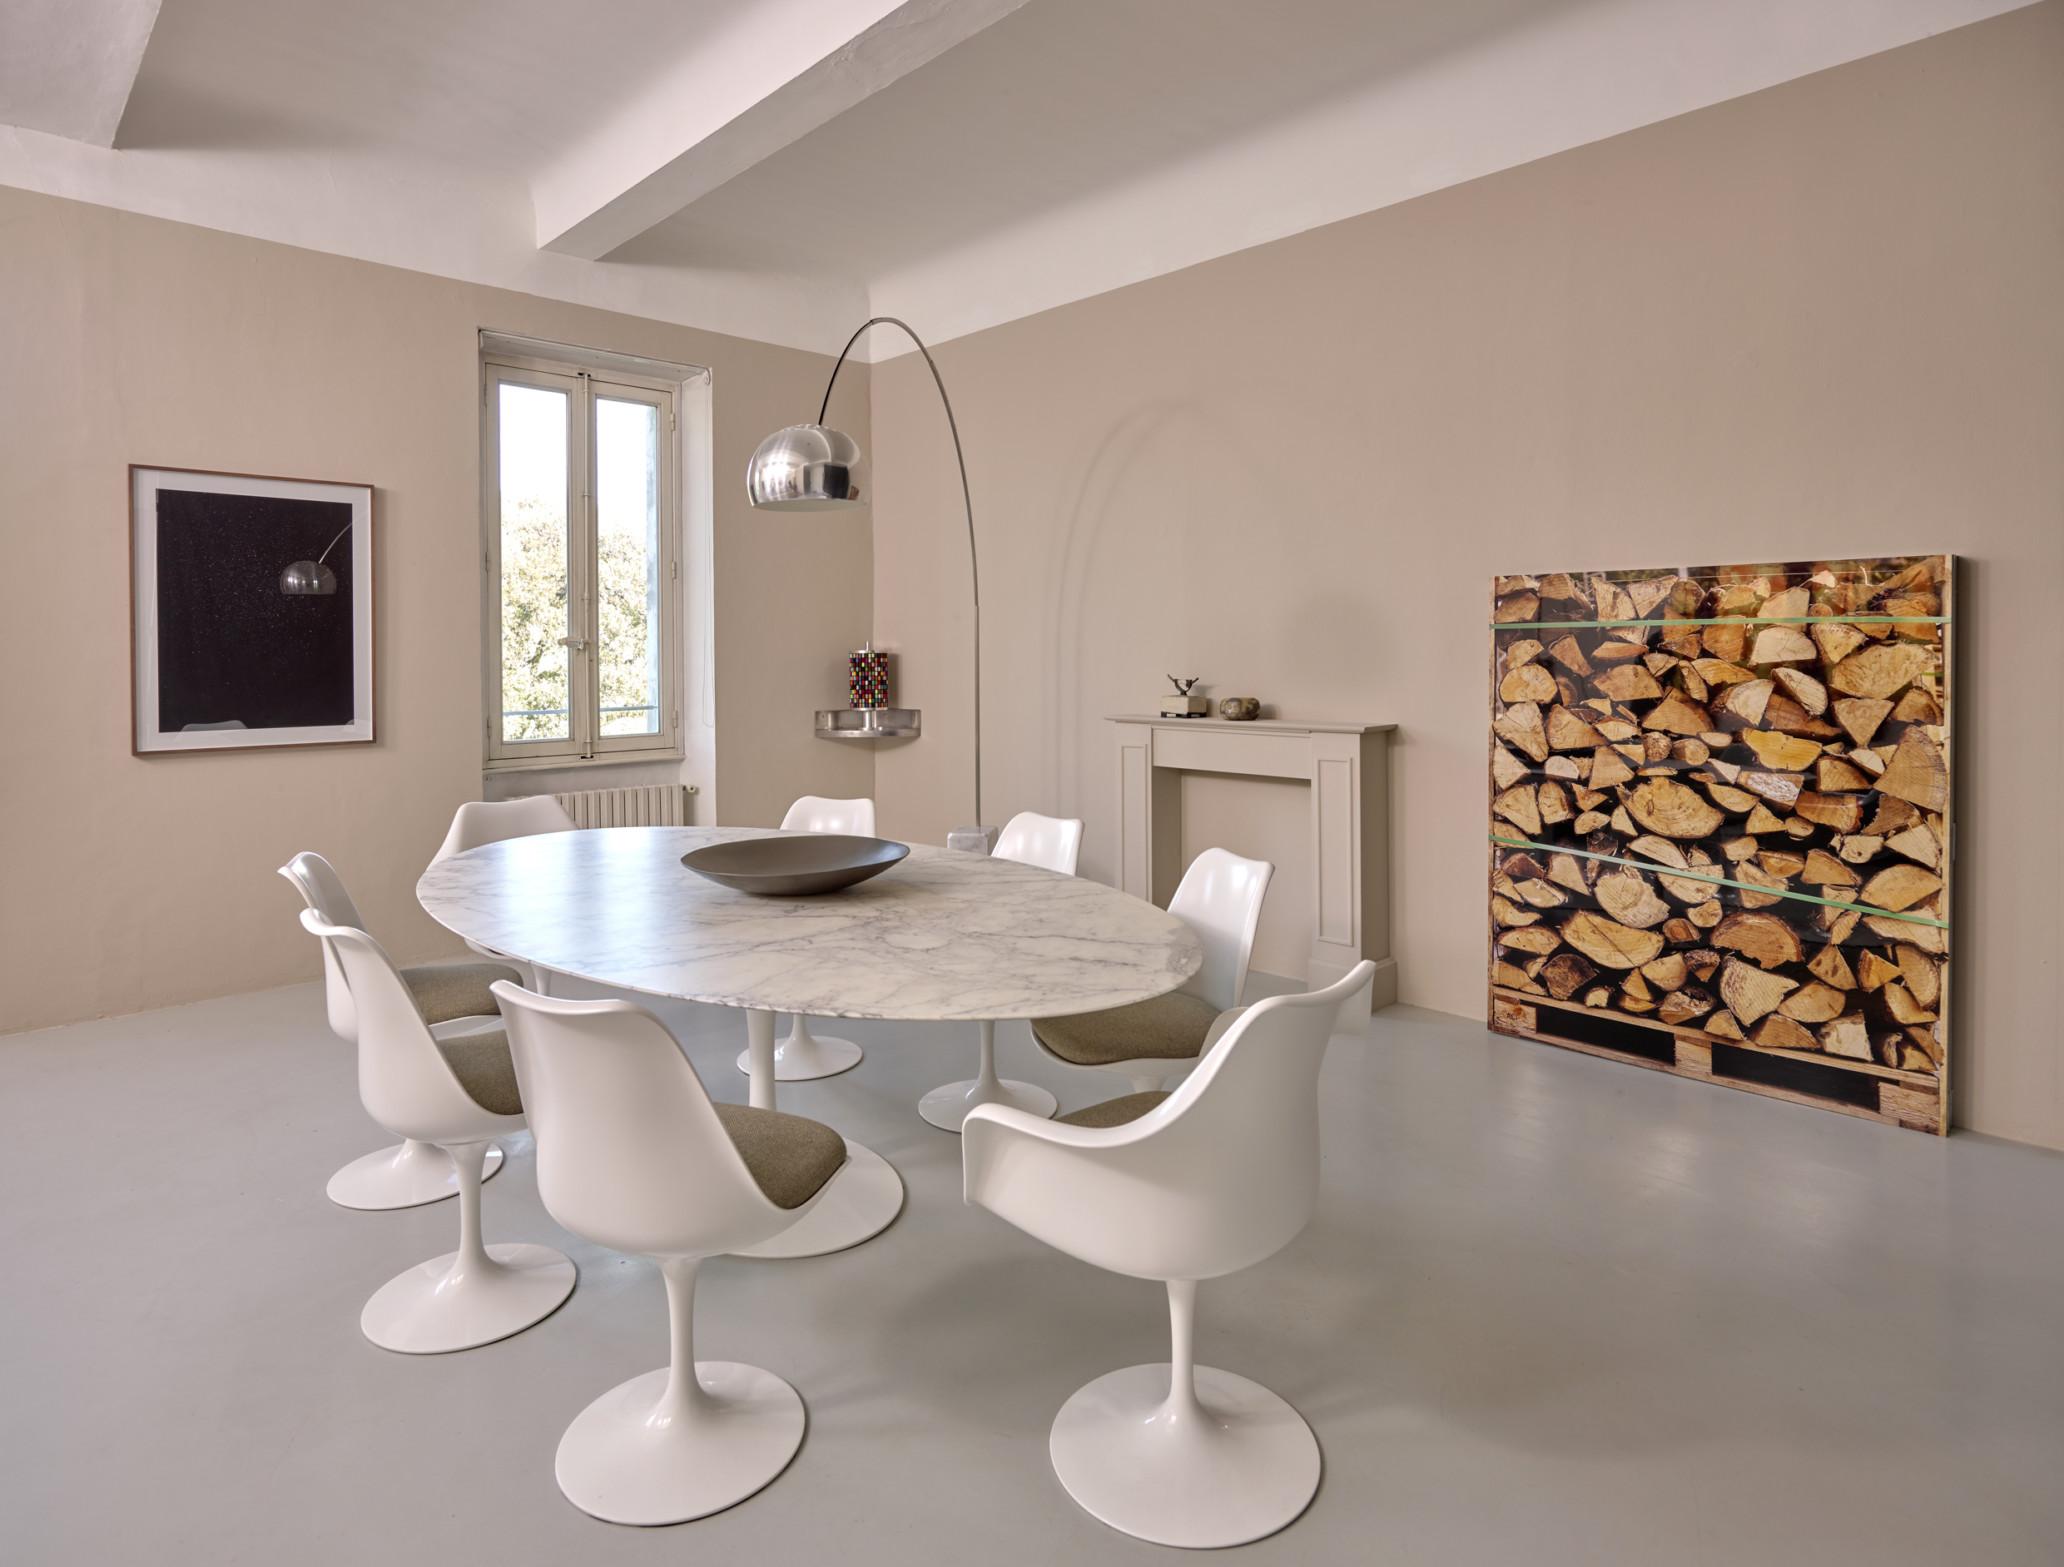 table Tulip Knoll International - Bel Oeil Nice Cannes Monaco - lampe Arco Flos